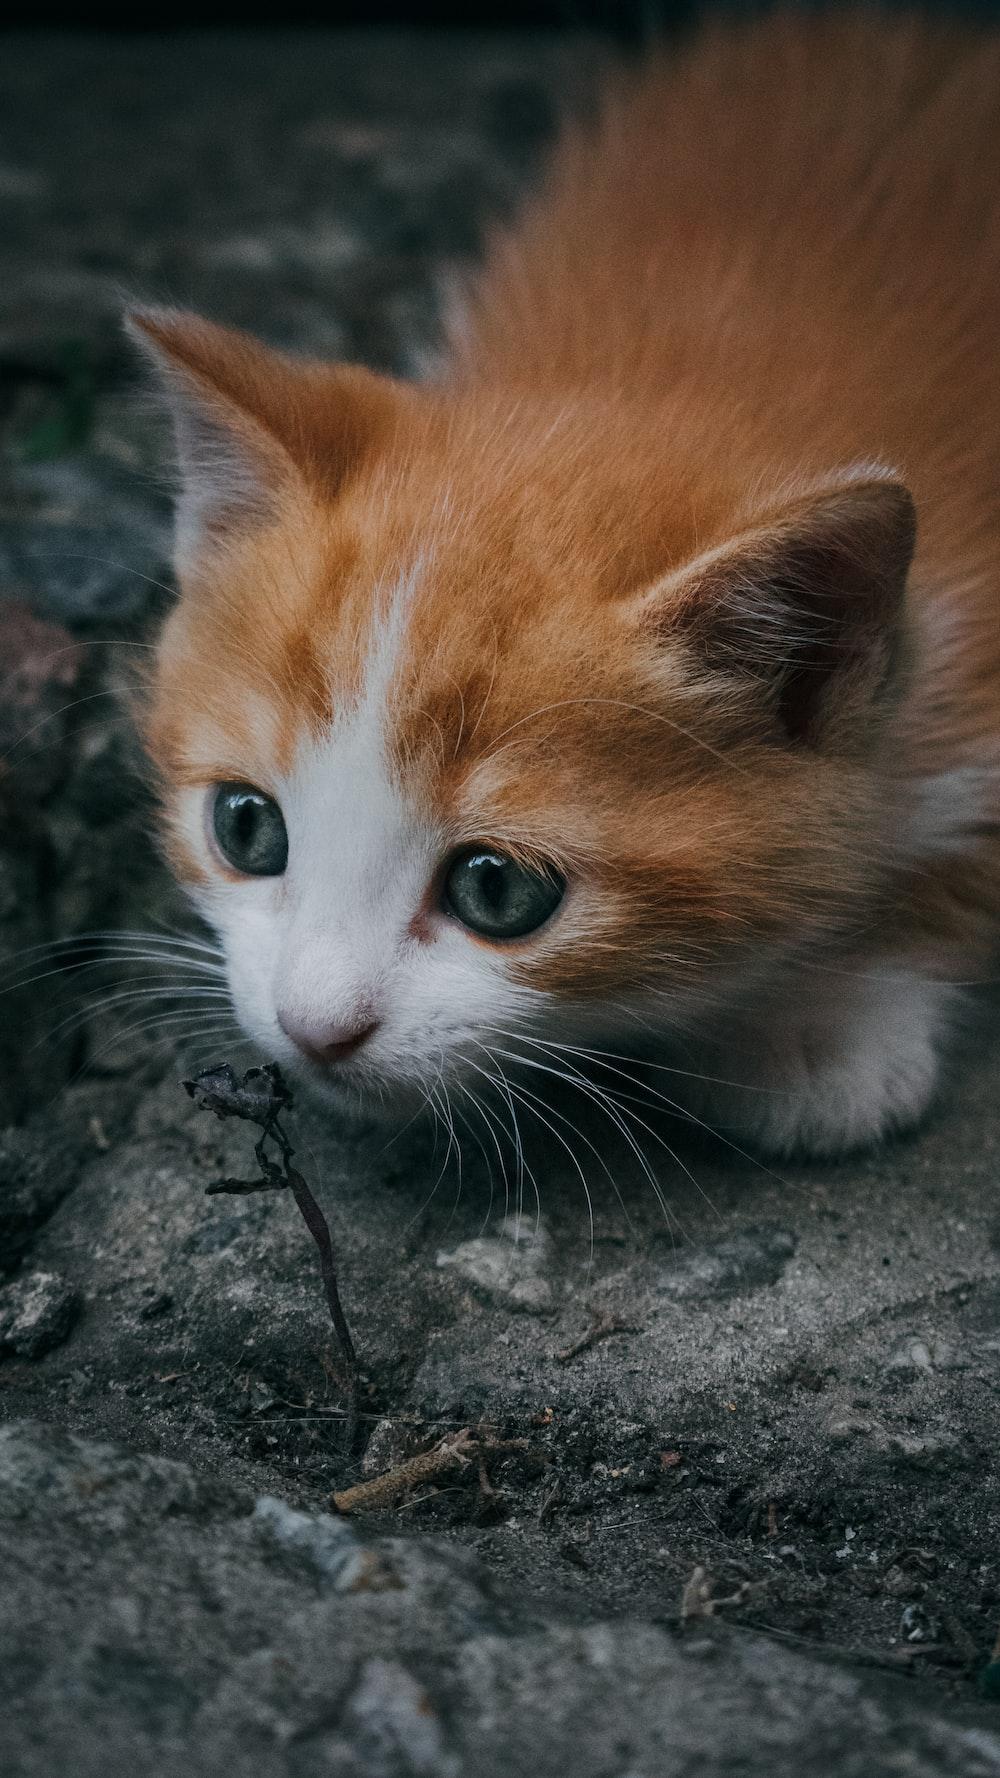 close-up photography of orange tabby kitten